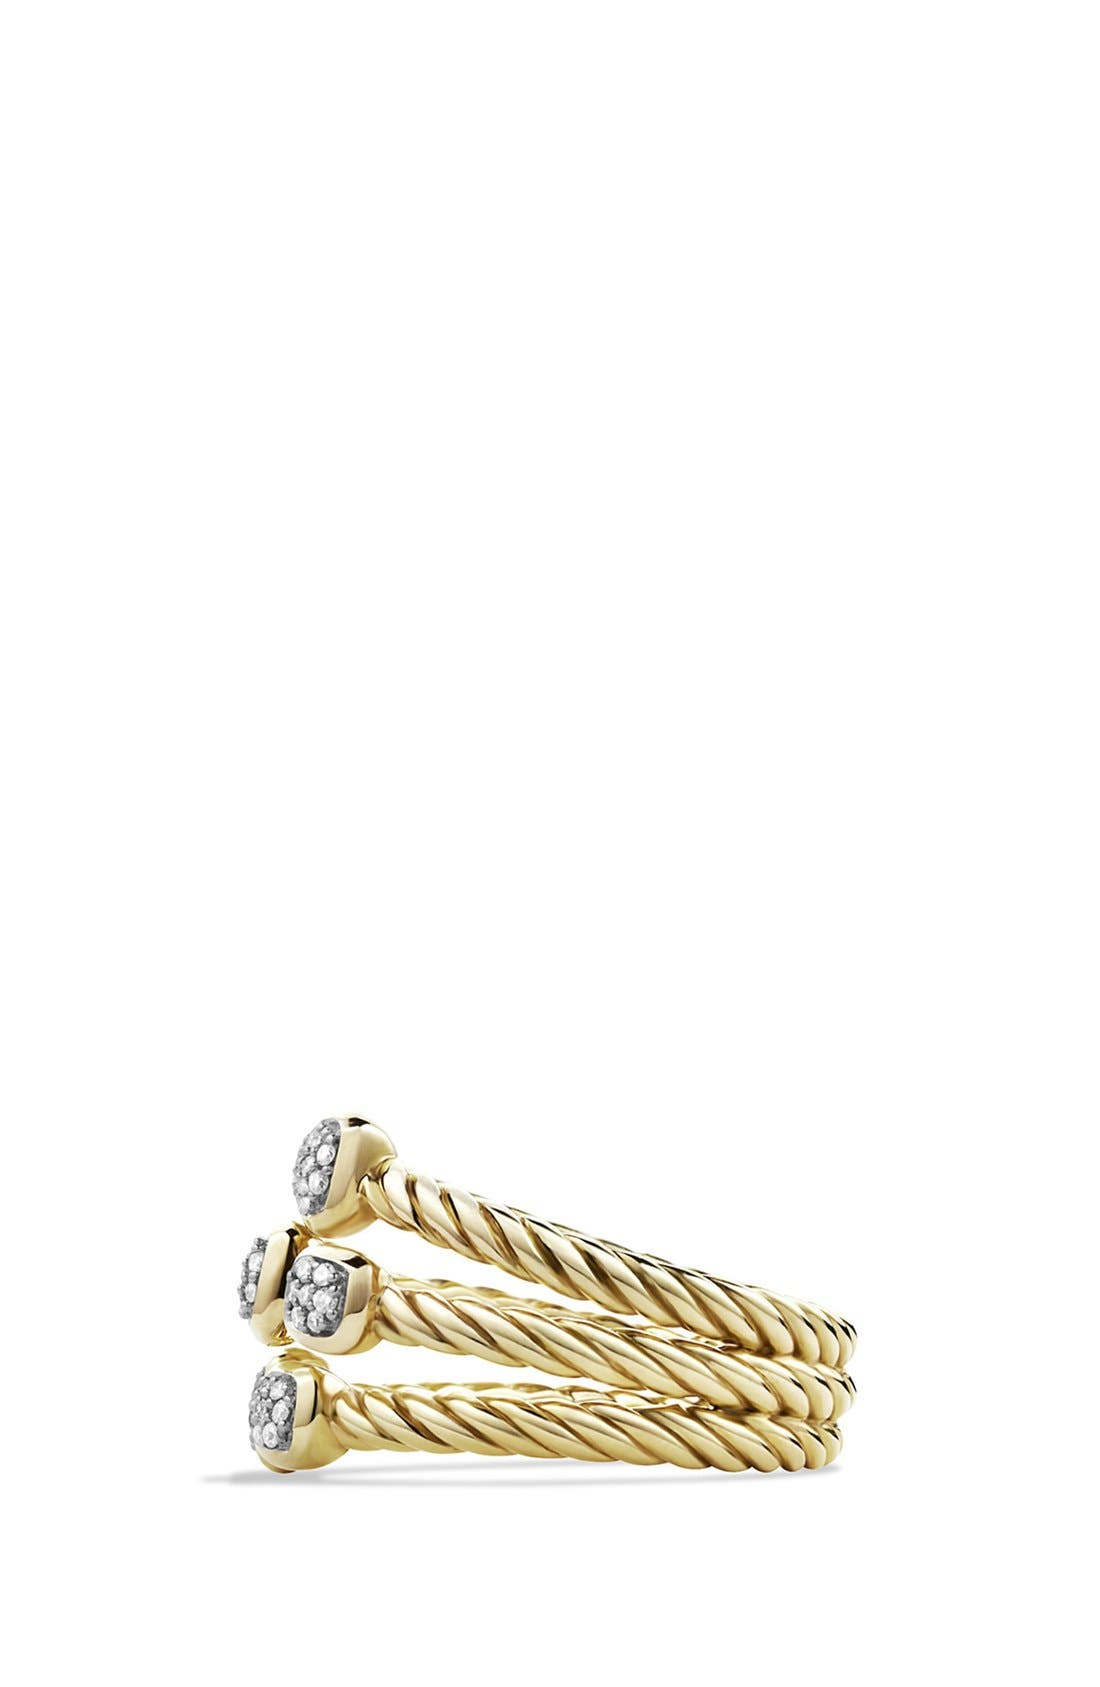 'Confetti' Ring with Diamonds in Gold,                             Alternate thumbnail 2, color,                             DIAMOND